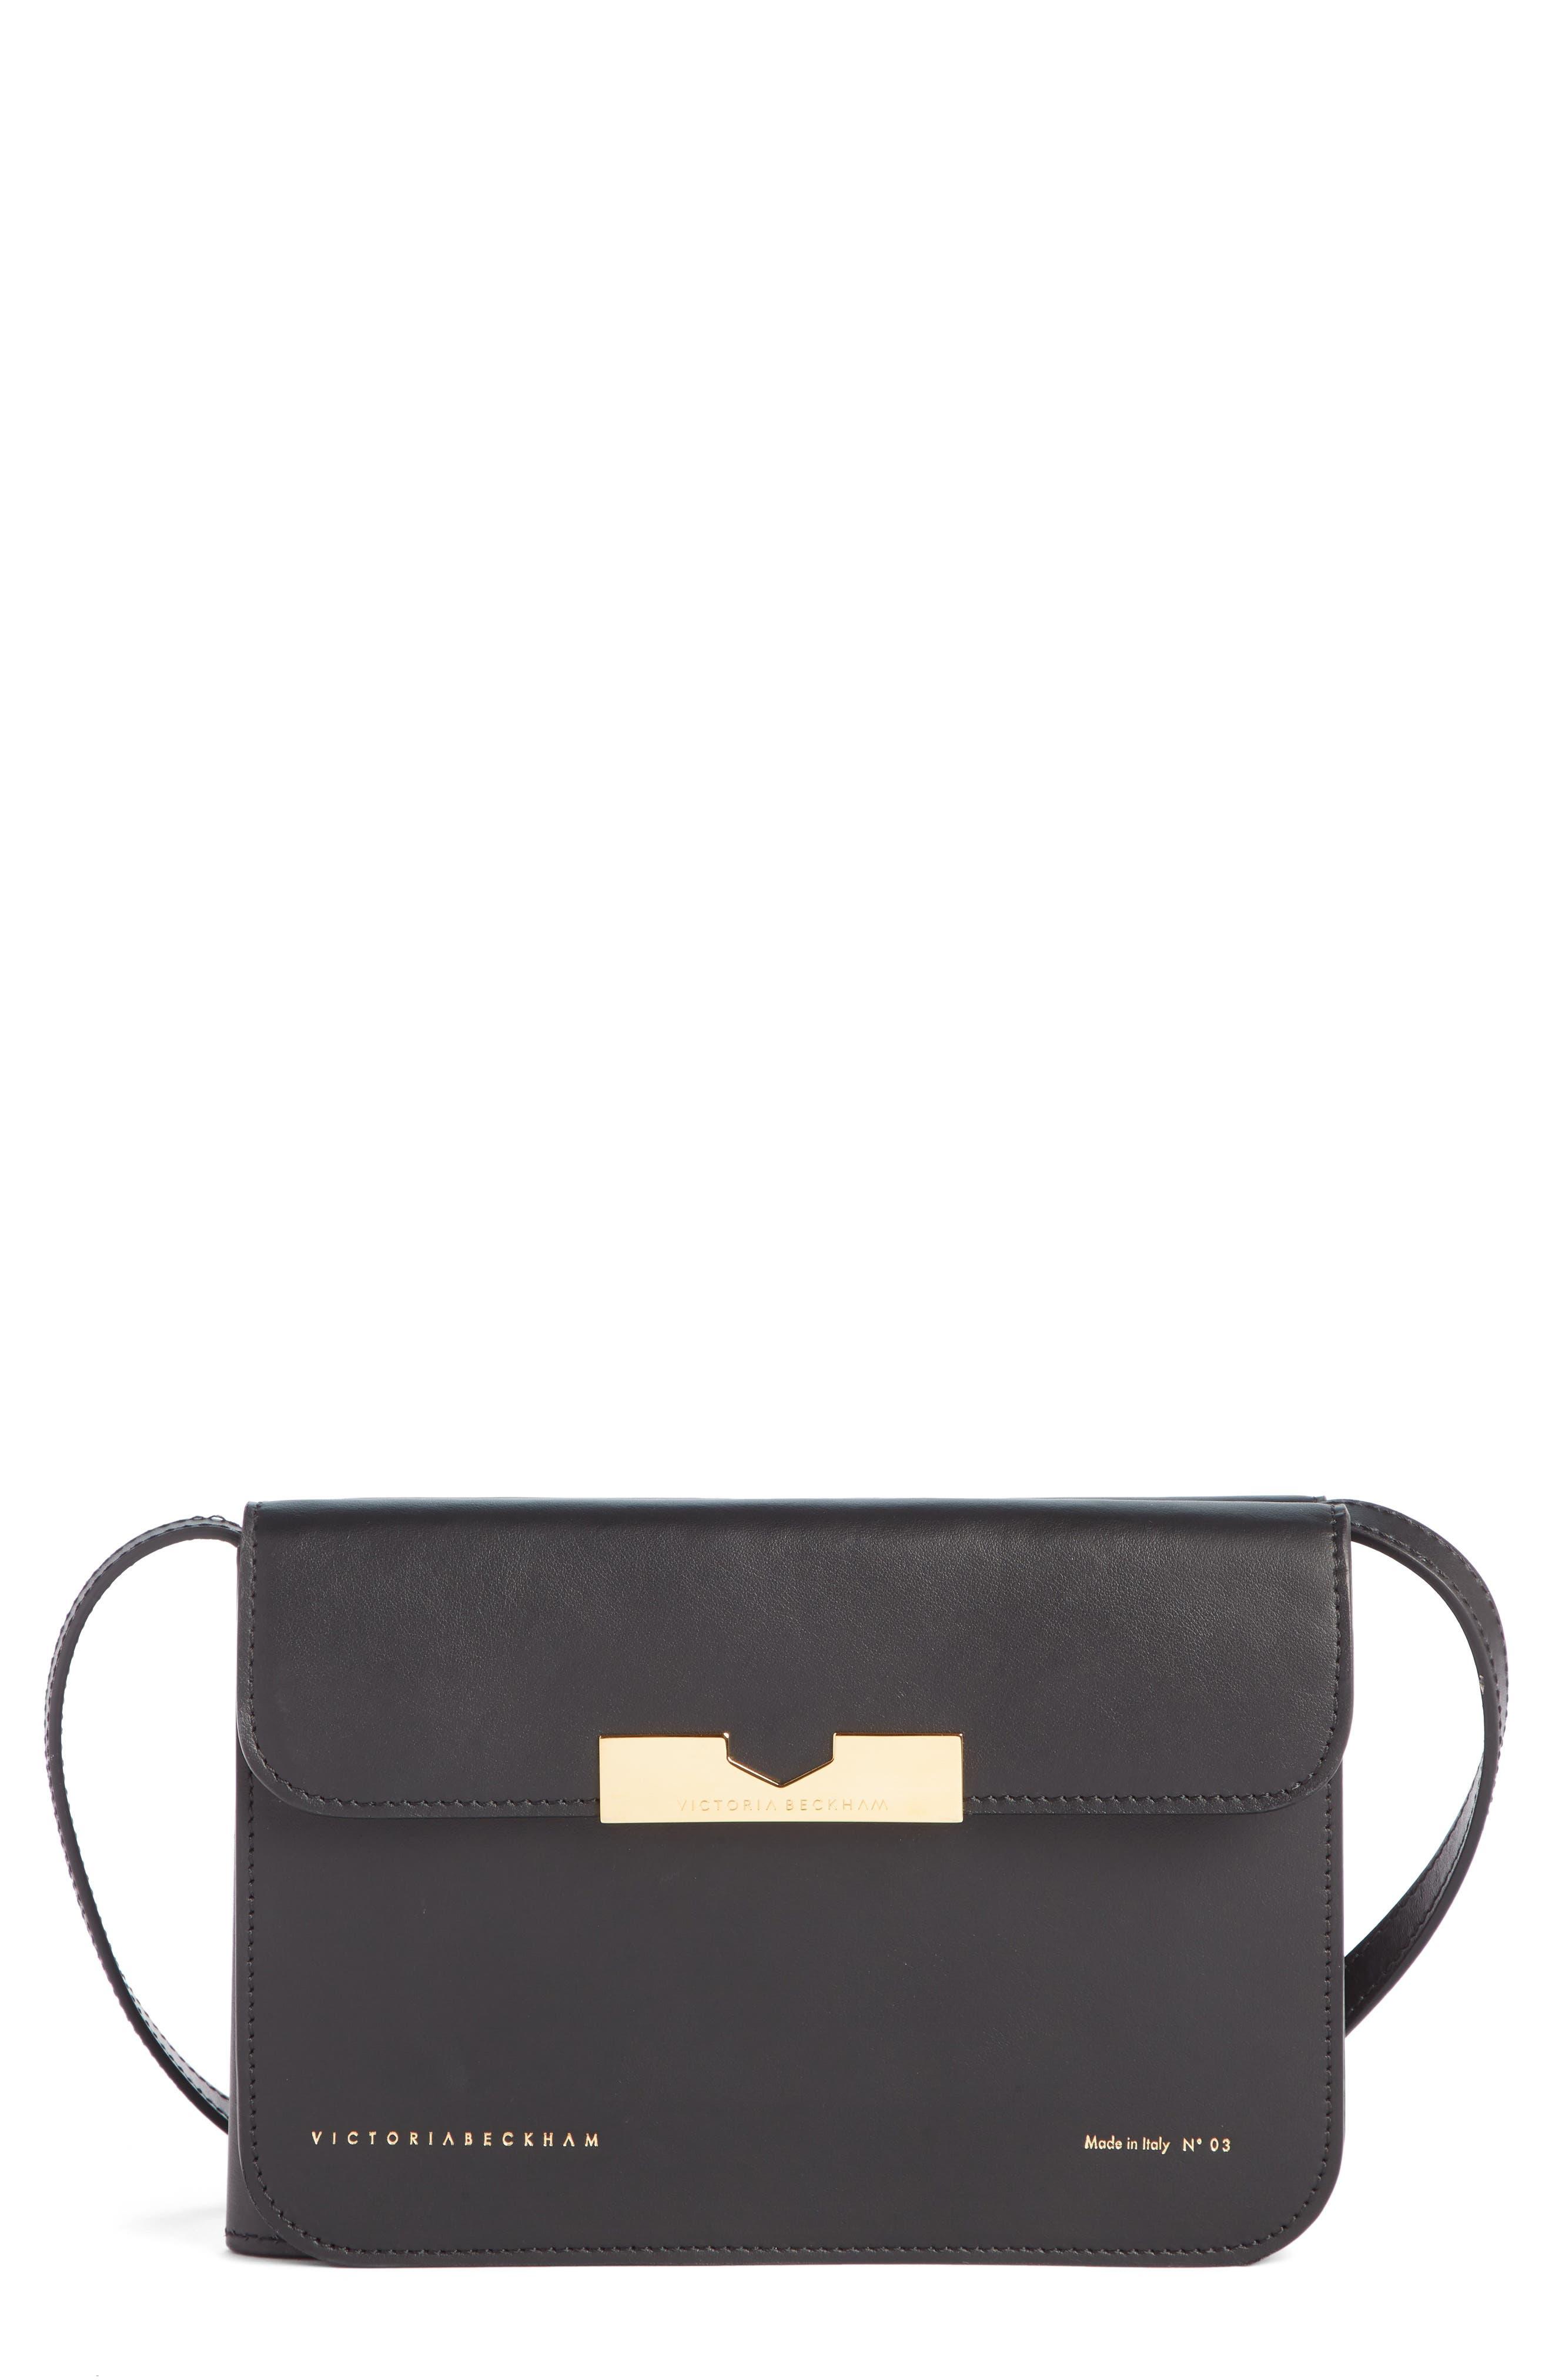 VICTORIA BECKHAM, Twin Leather Crossbody Bag, Main thumbnail 1, color, BLACK